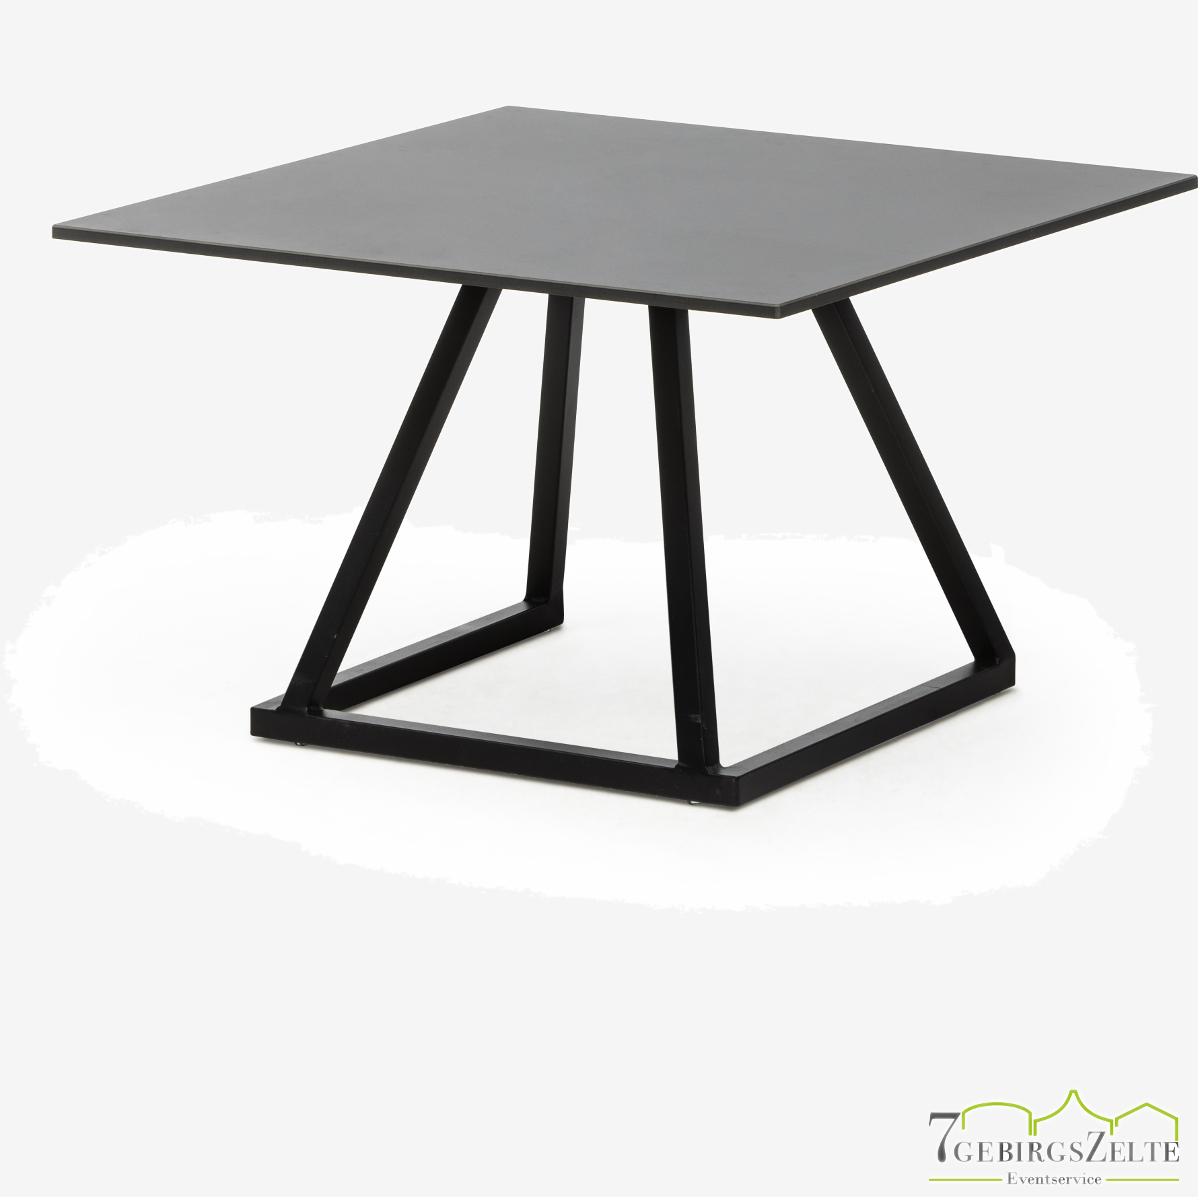 Linéa Lounge 70x70x40 - alu schwarz  - Tischplatte Farbe: variabel